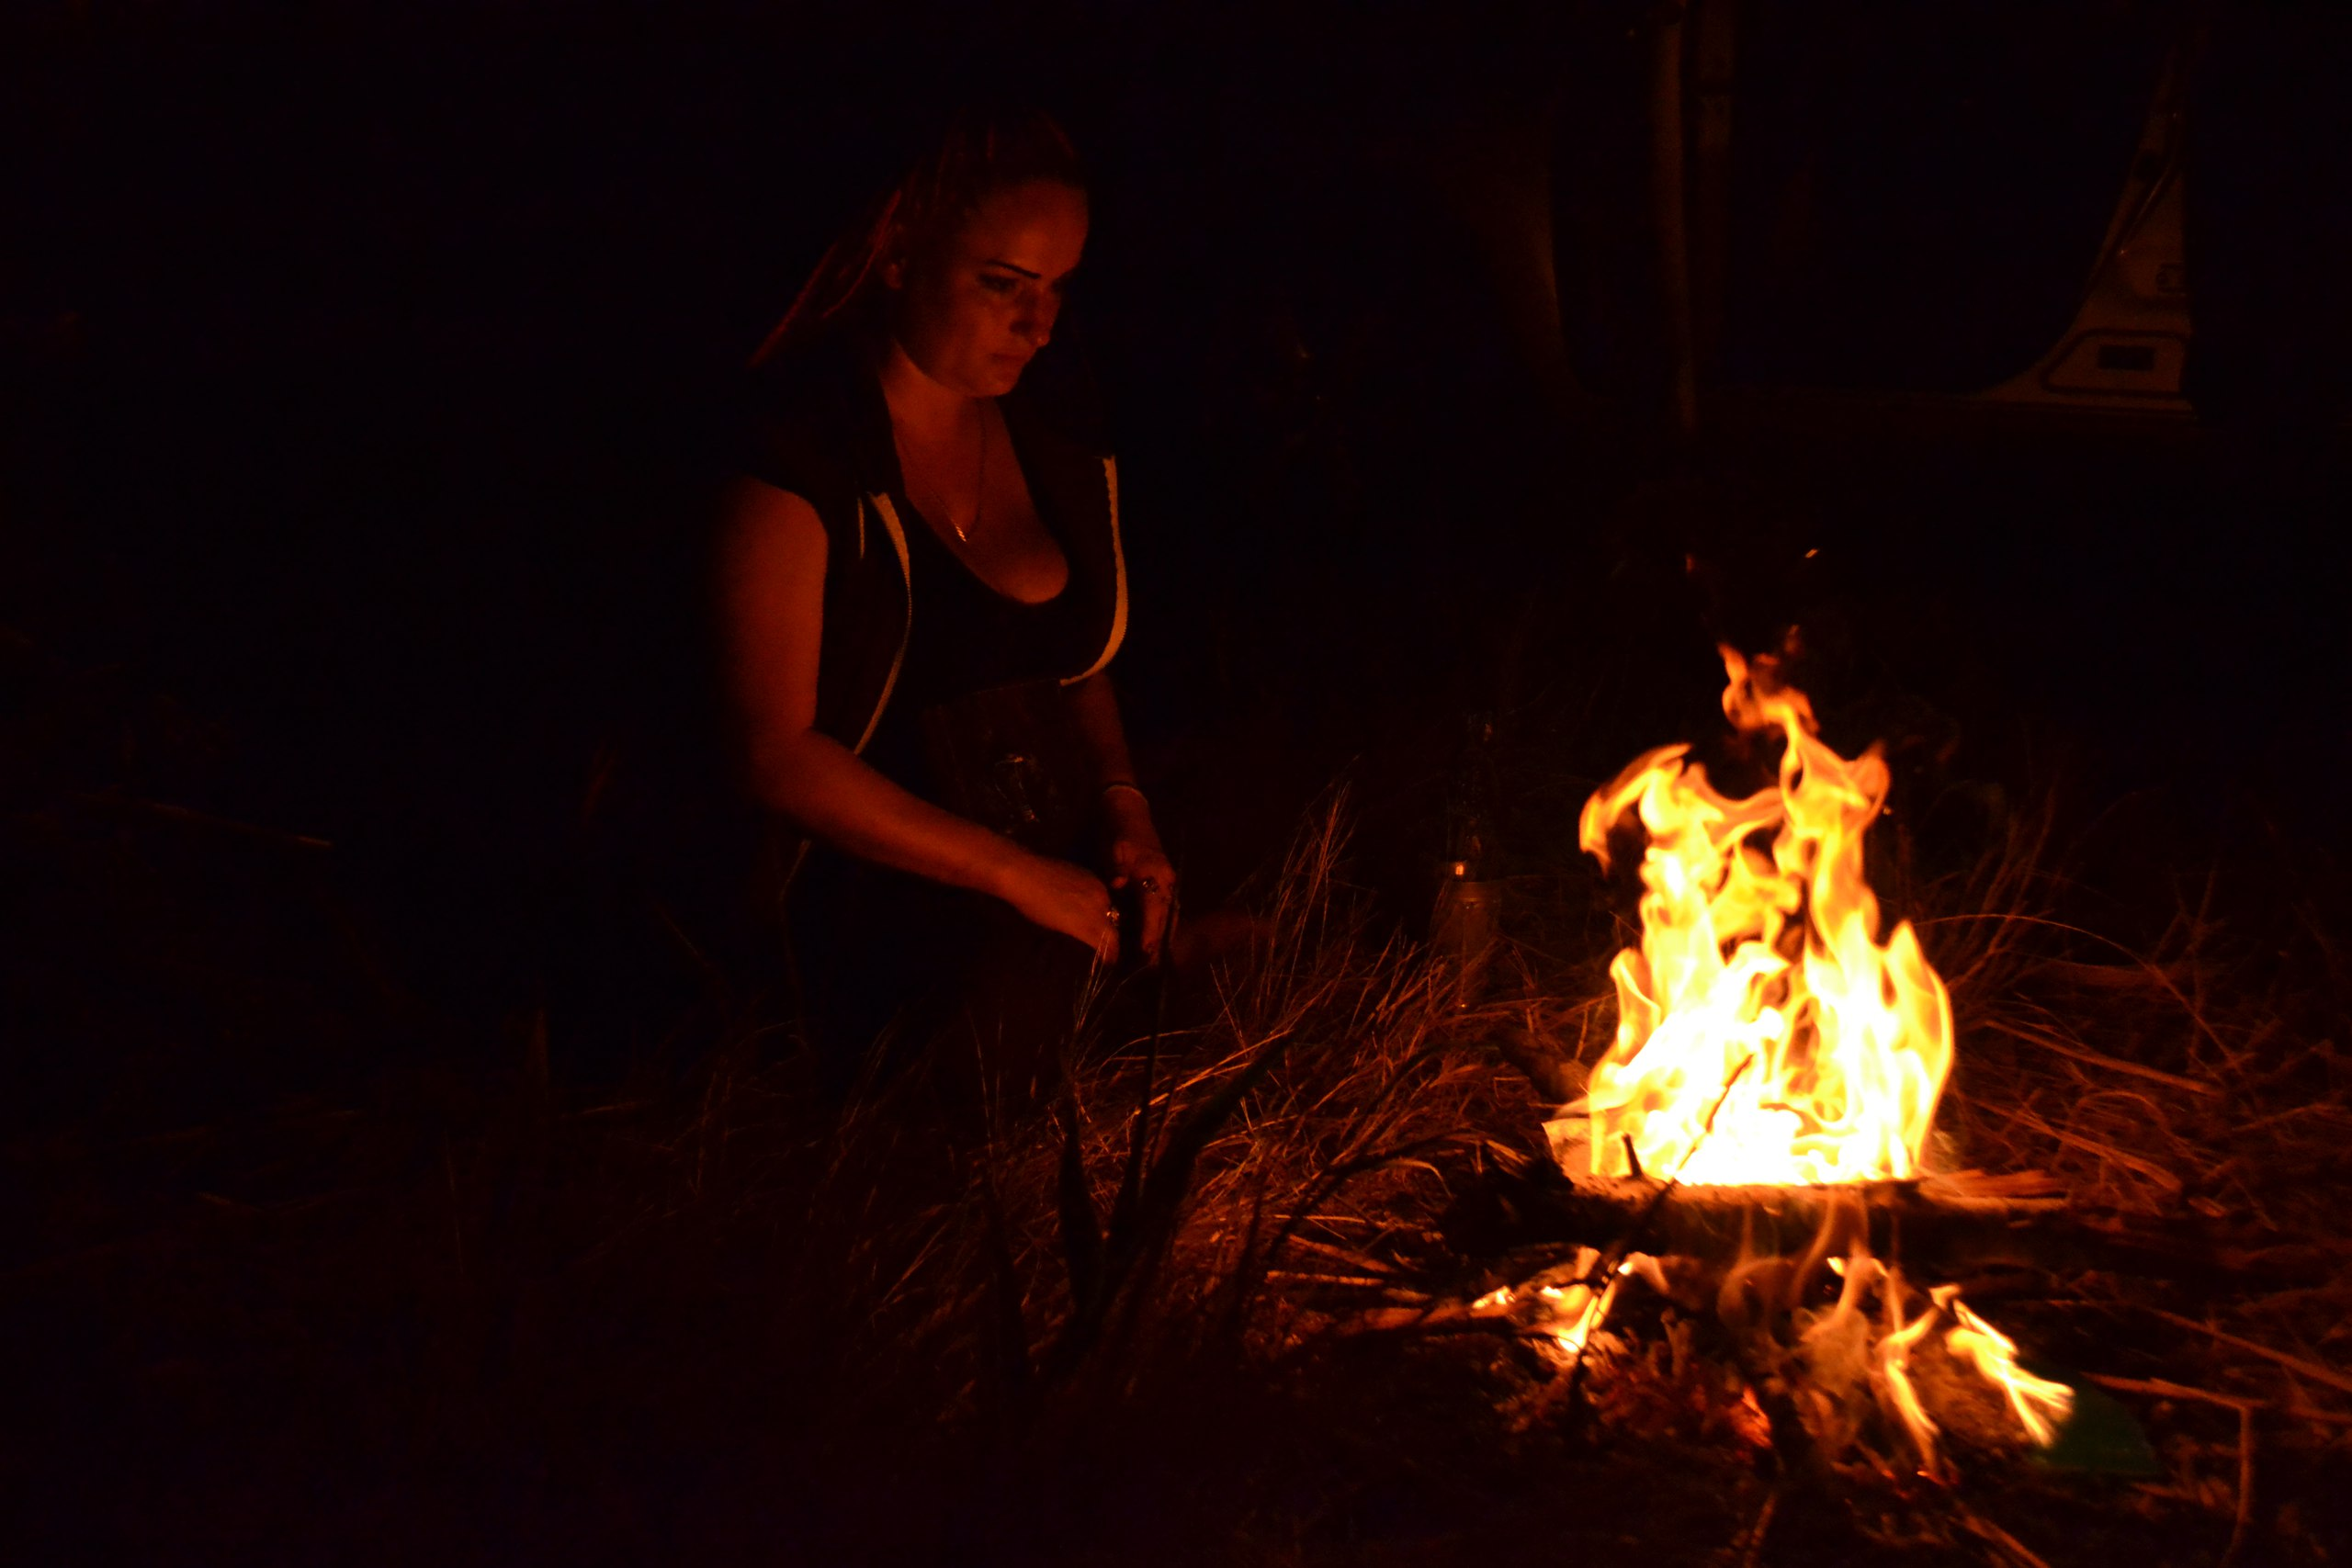 Елена Руденко (Валтея) Украина. Одесса. 17-21 августа 2016 г. - Страница 2 Lnb0Vj-y3nw